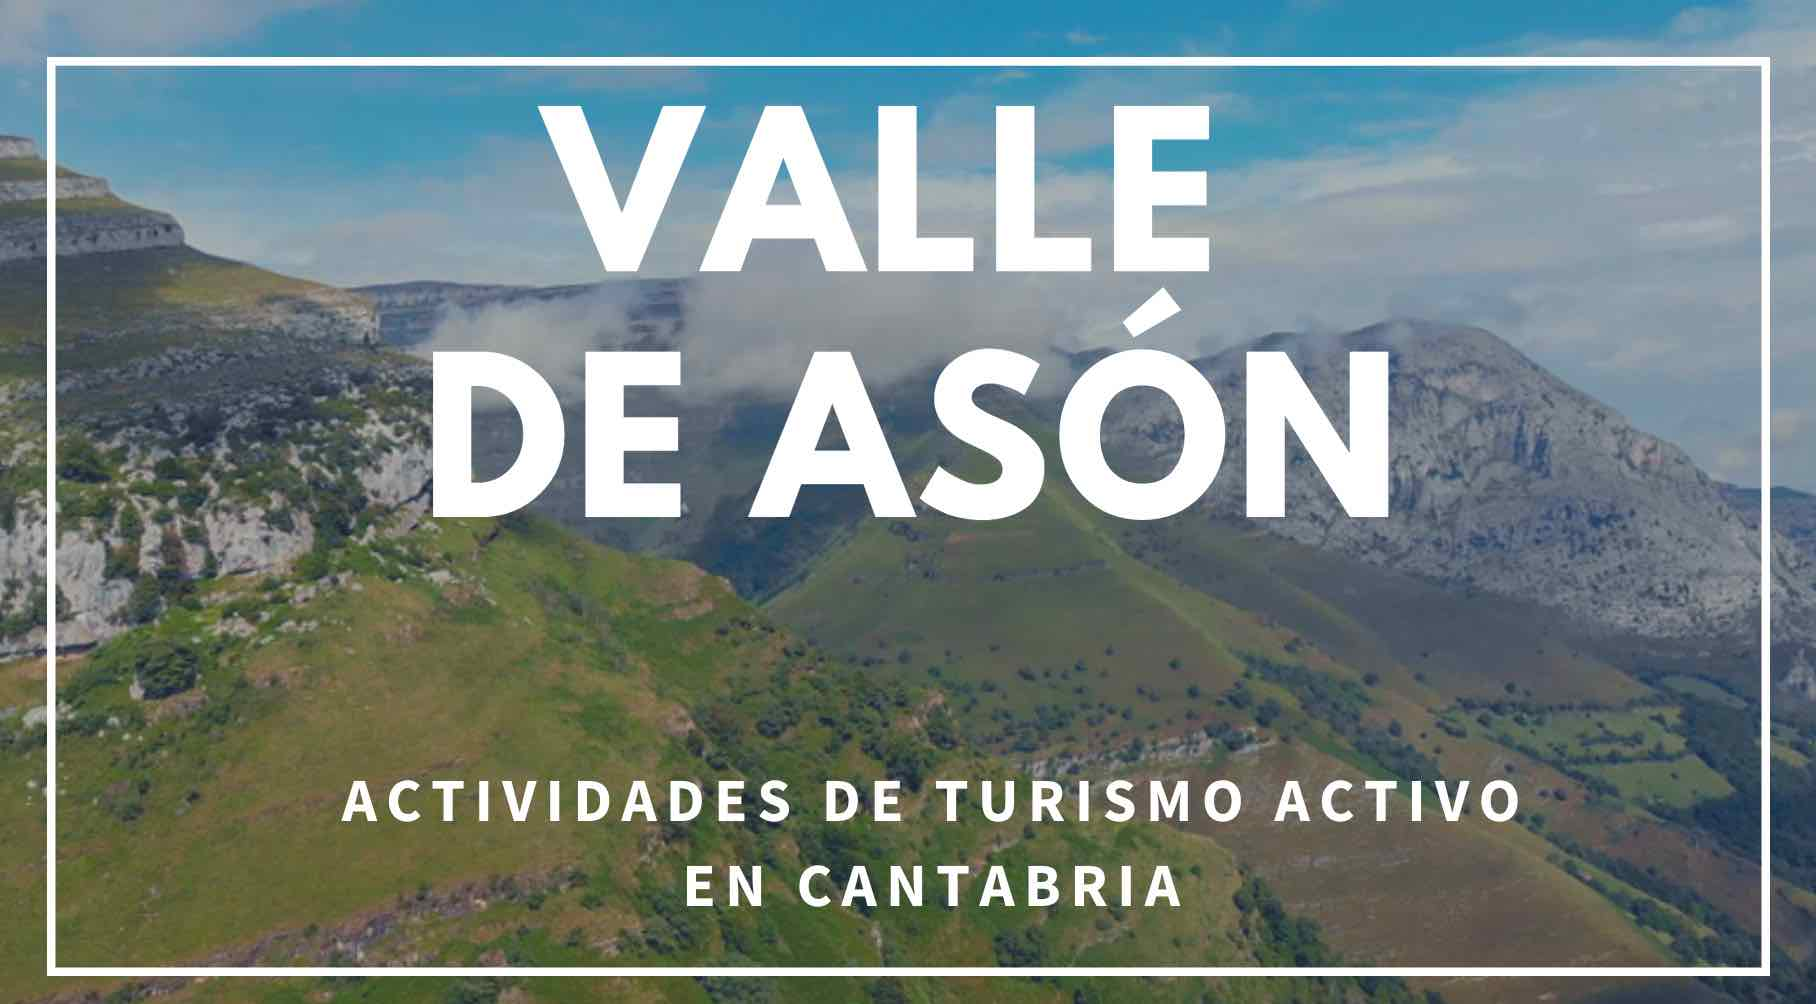 Actividades de Turismos activo en el Valle de Asón Cantabria